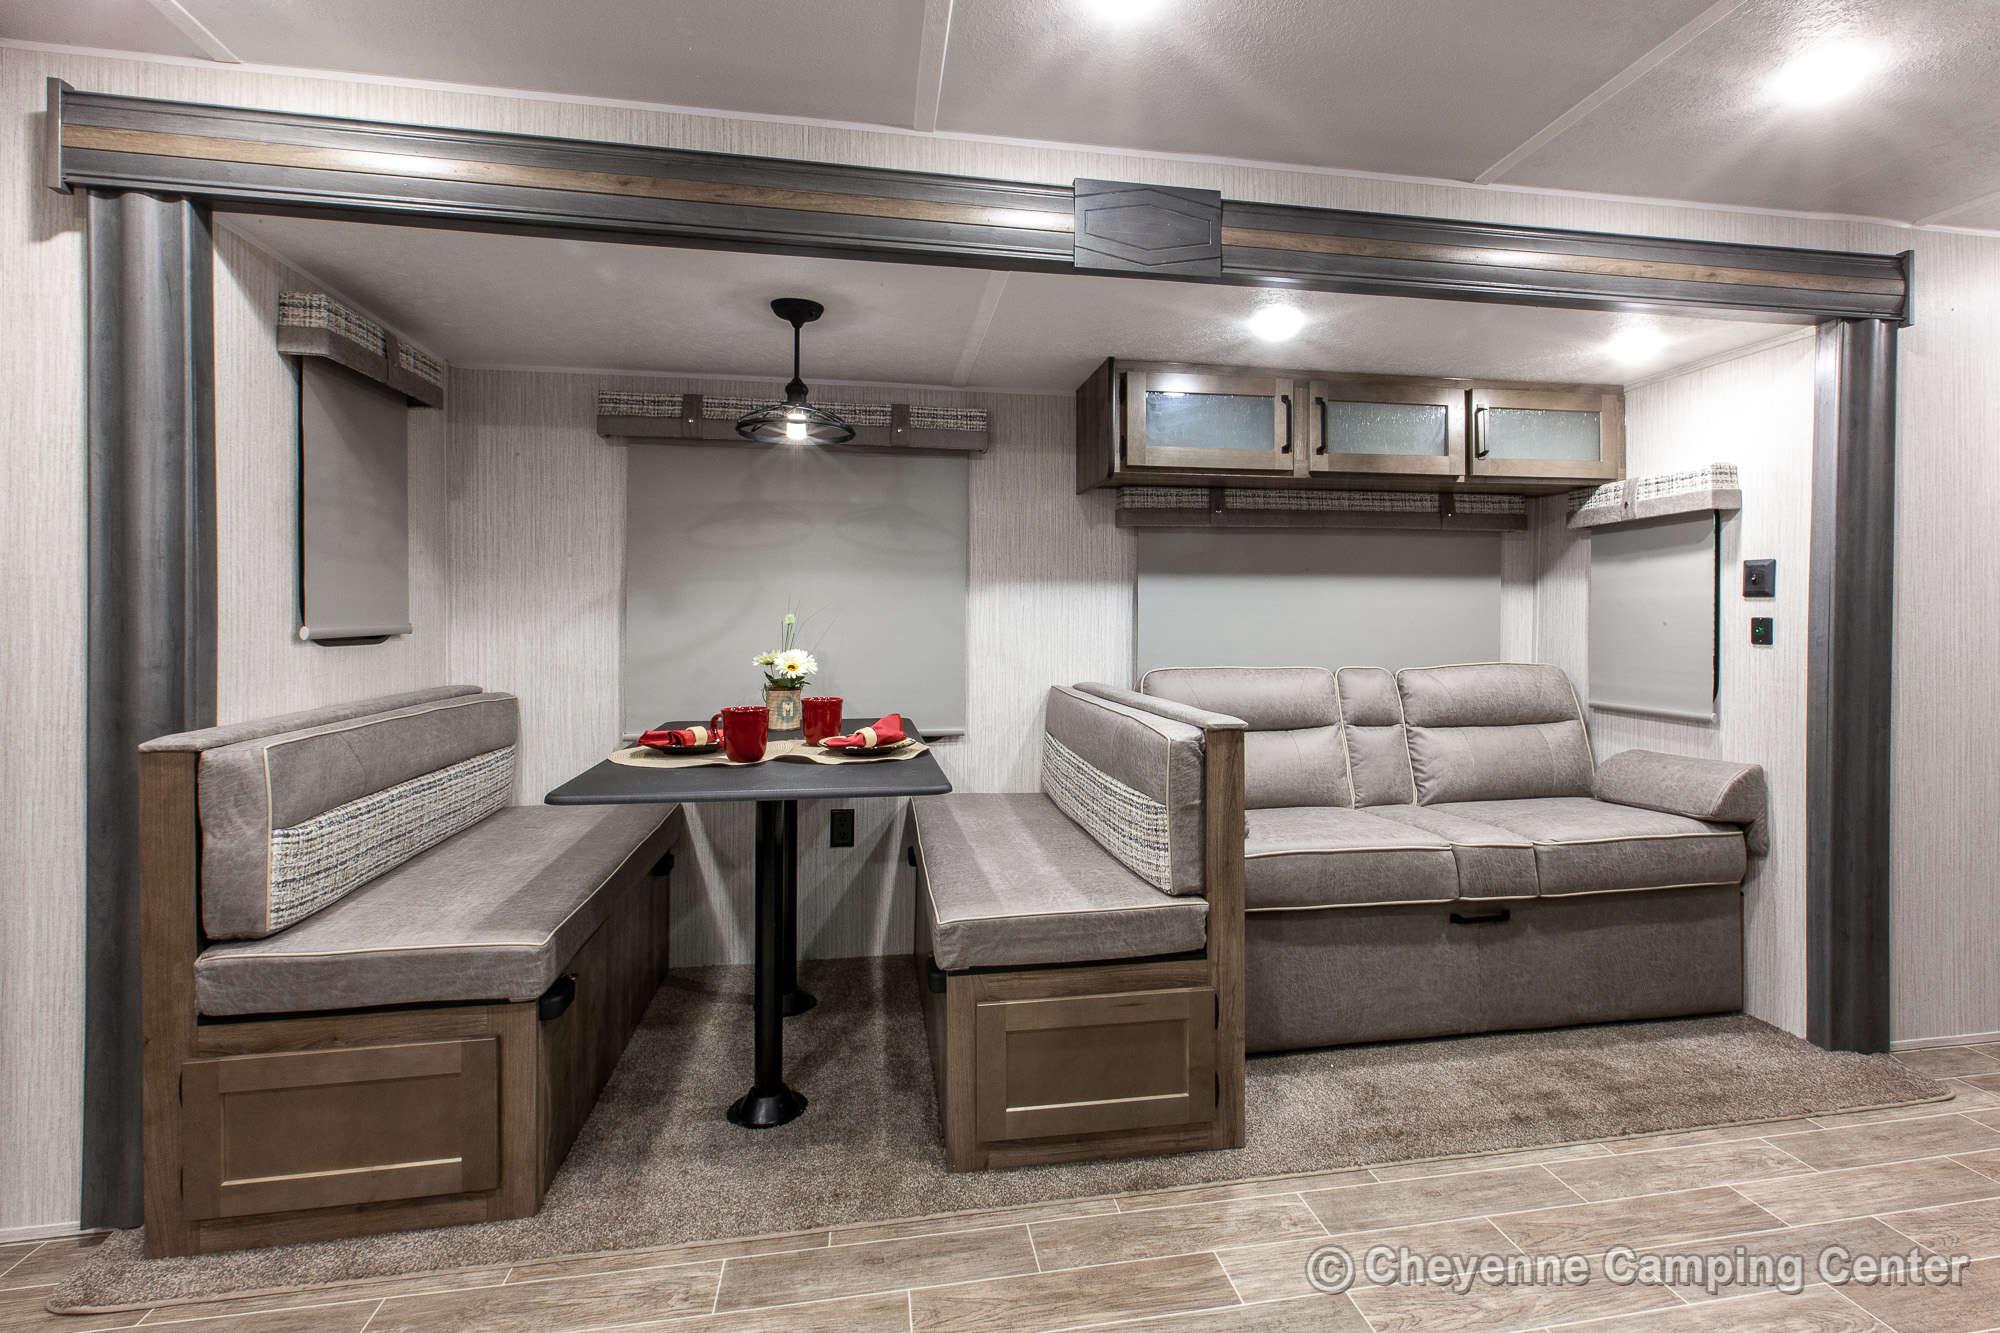 2021 Palomino Puma 25RKQB Travel Trailer Interior Image